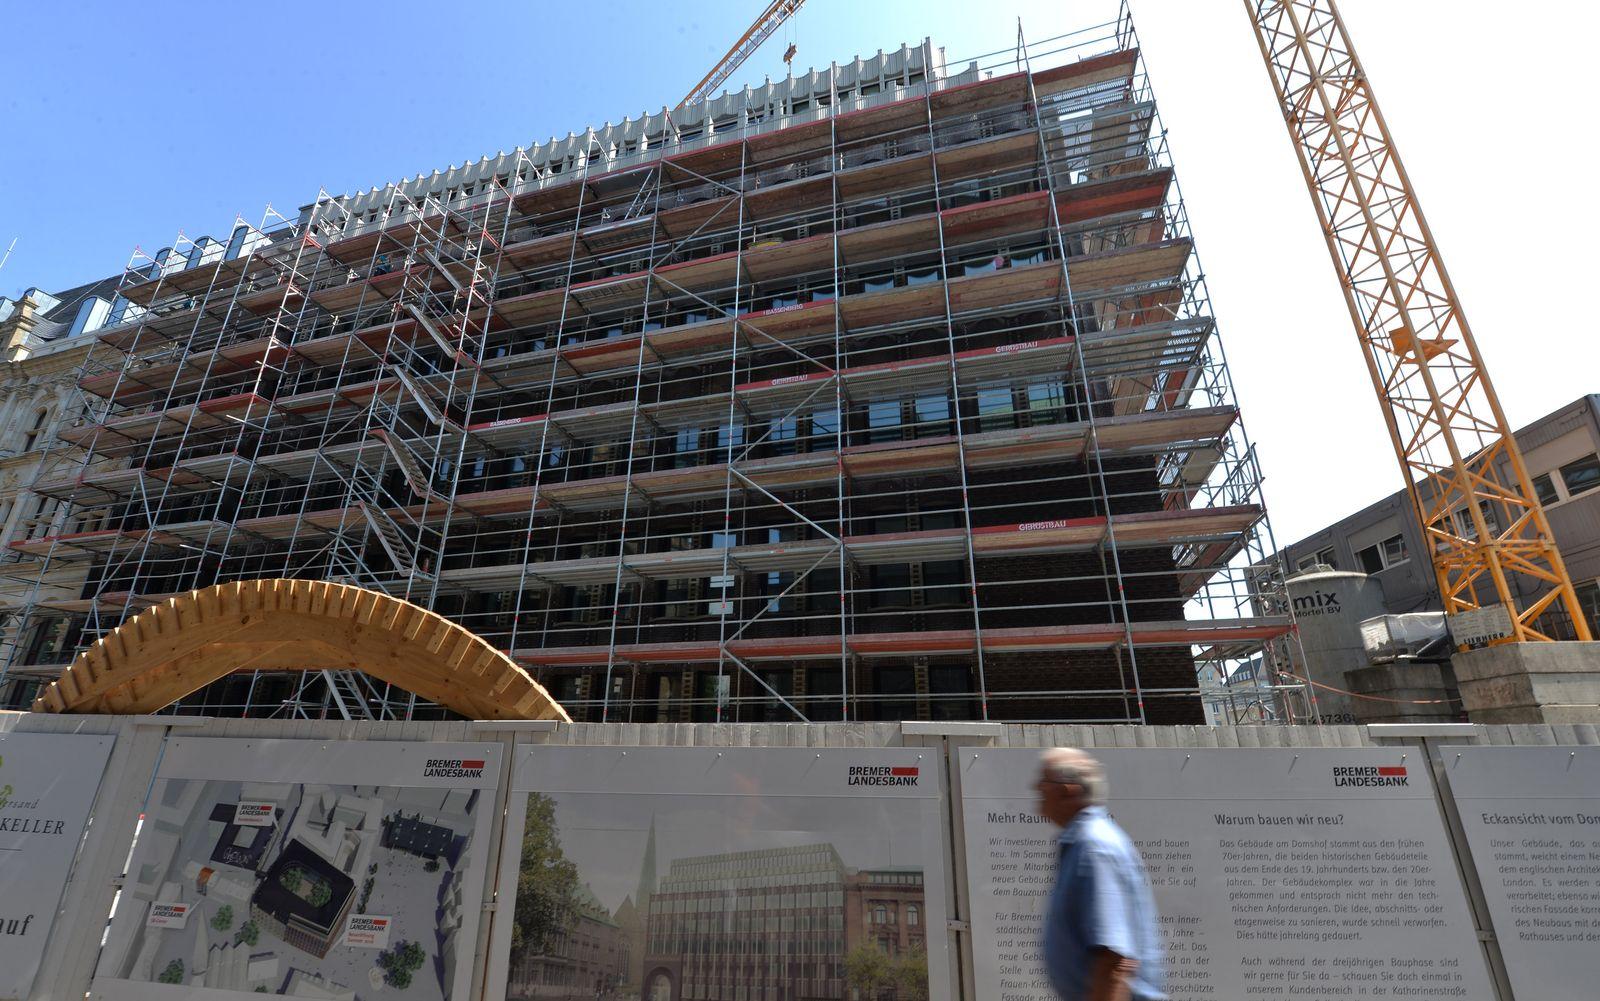 Neubau Bremer Landesbank